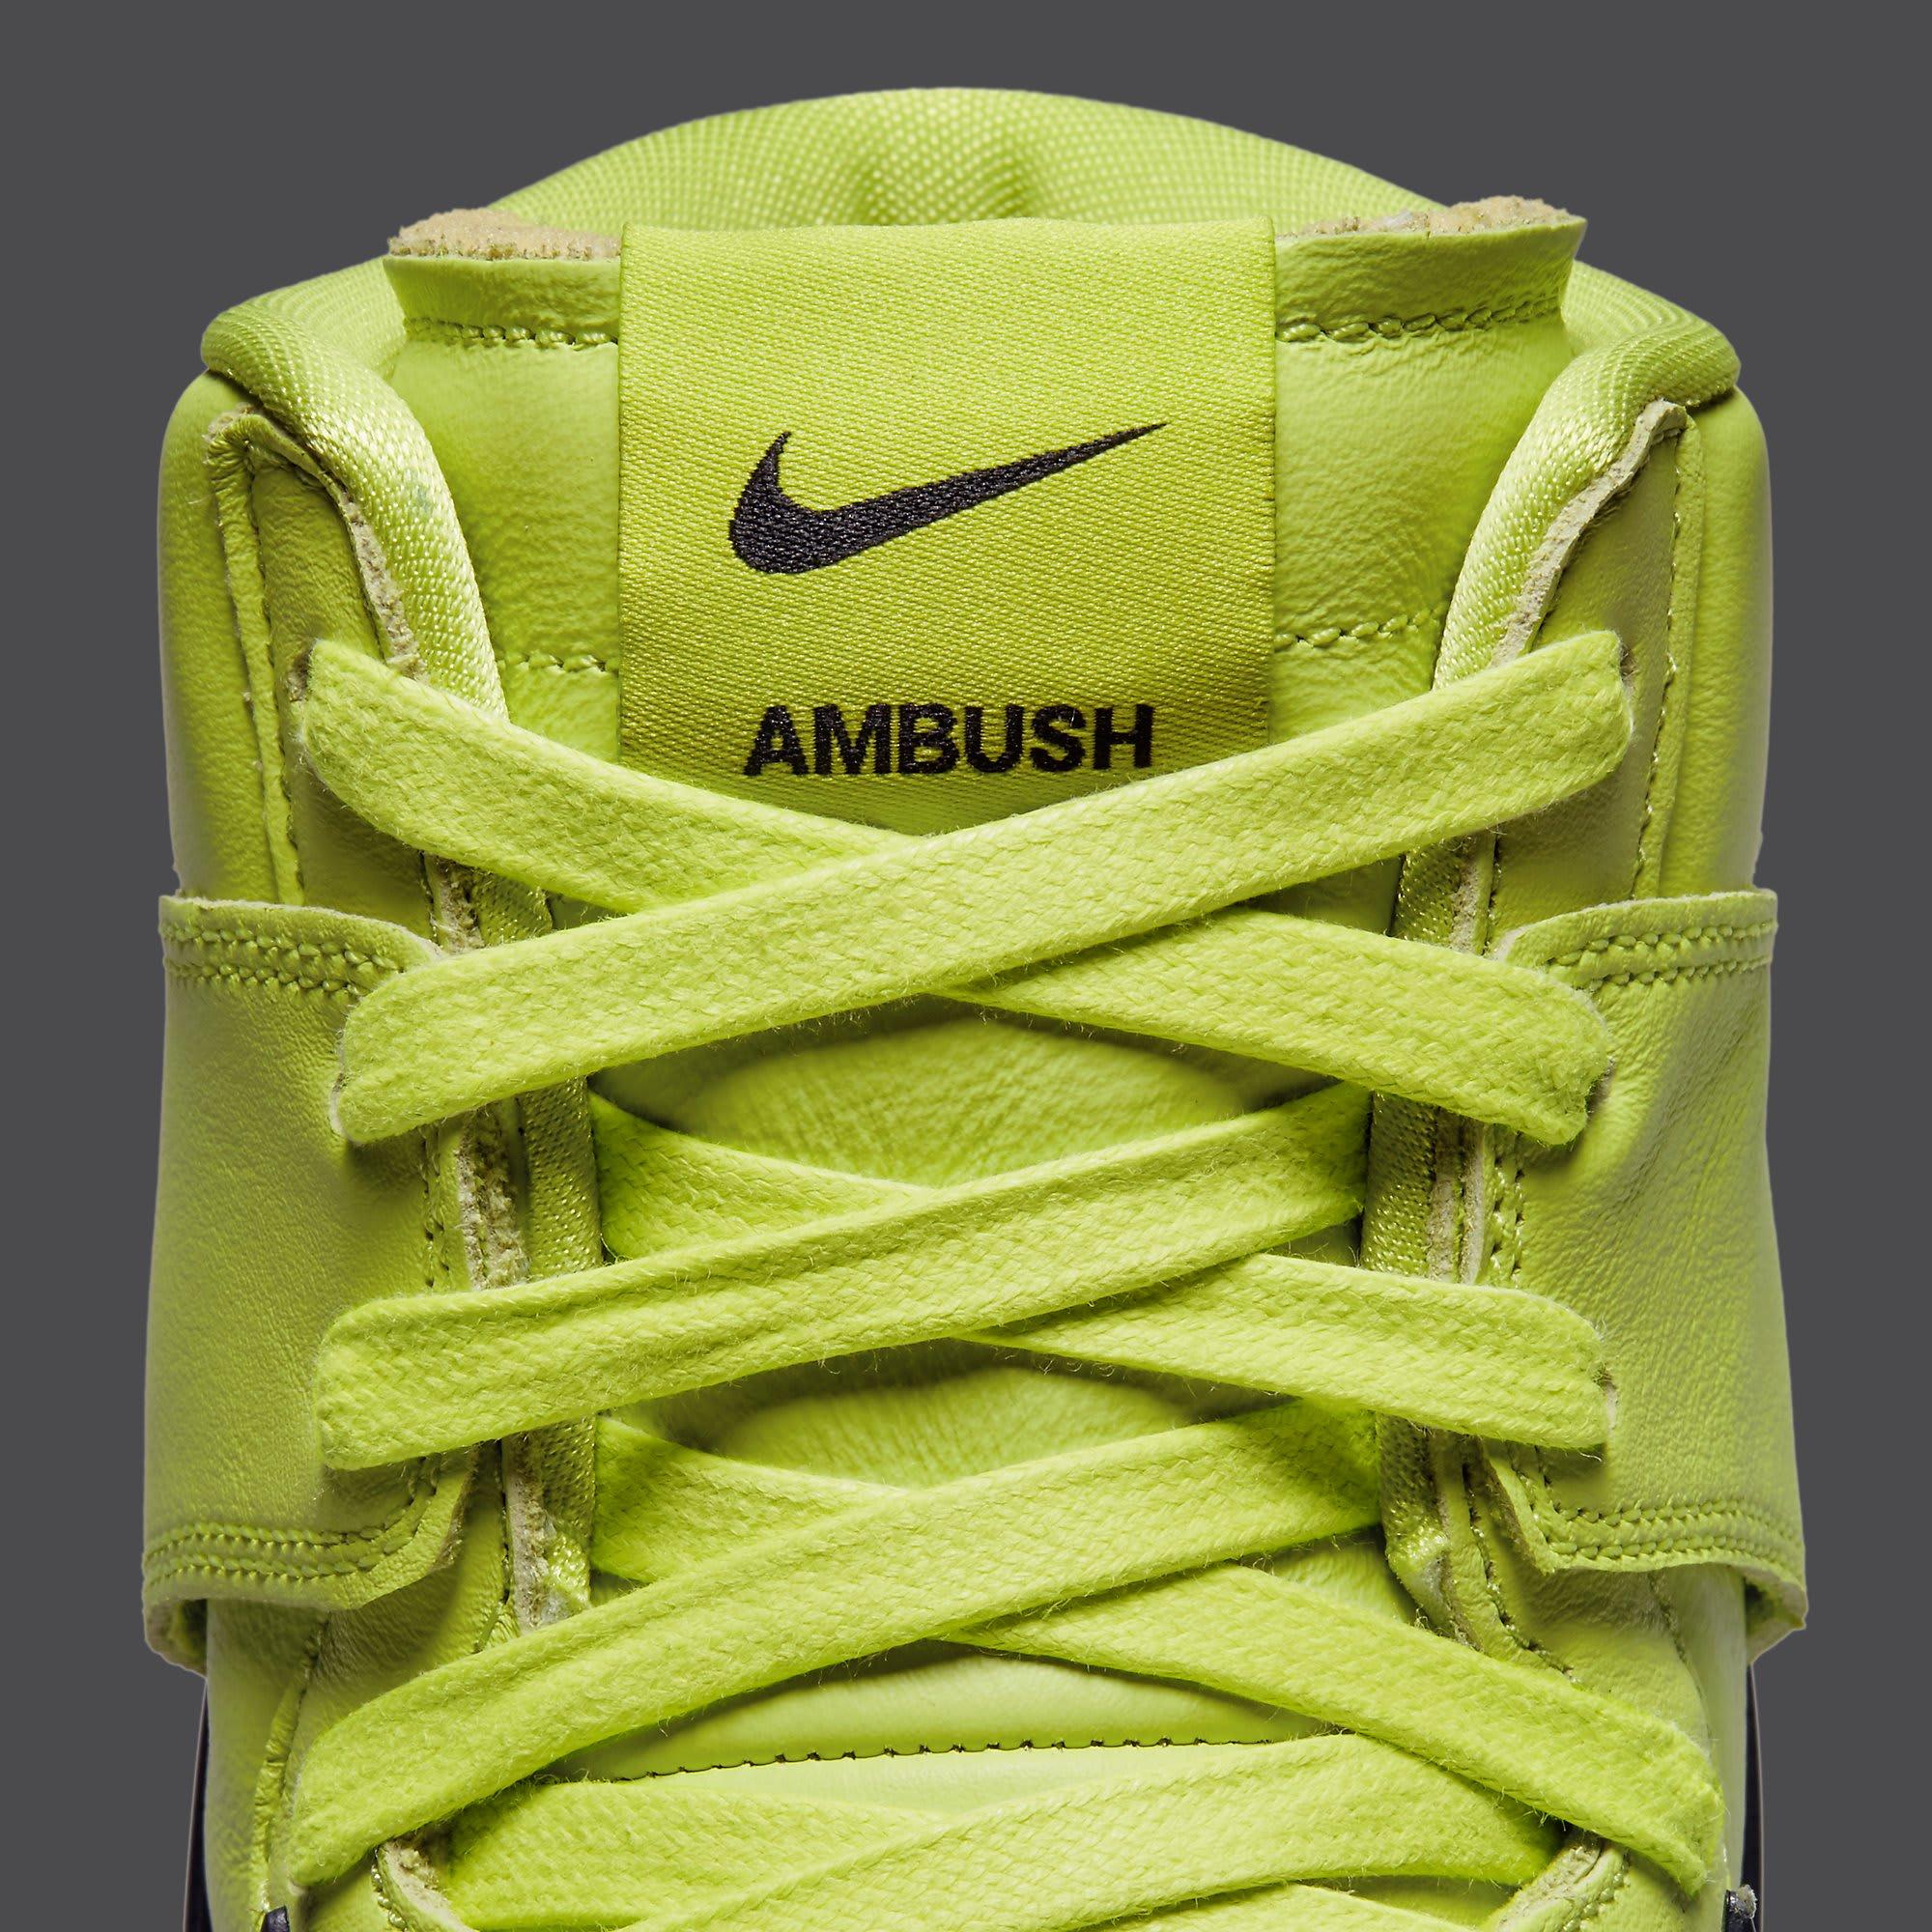 Ambush x Nike Dunk High Atomic Green Release Date CU7544-300 Tongue